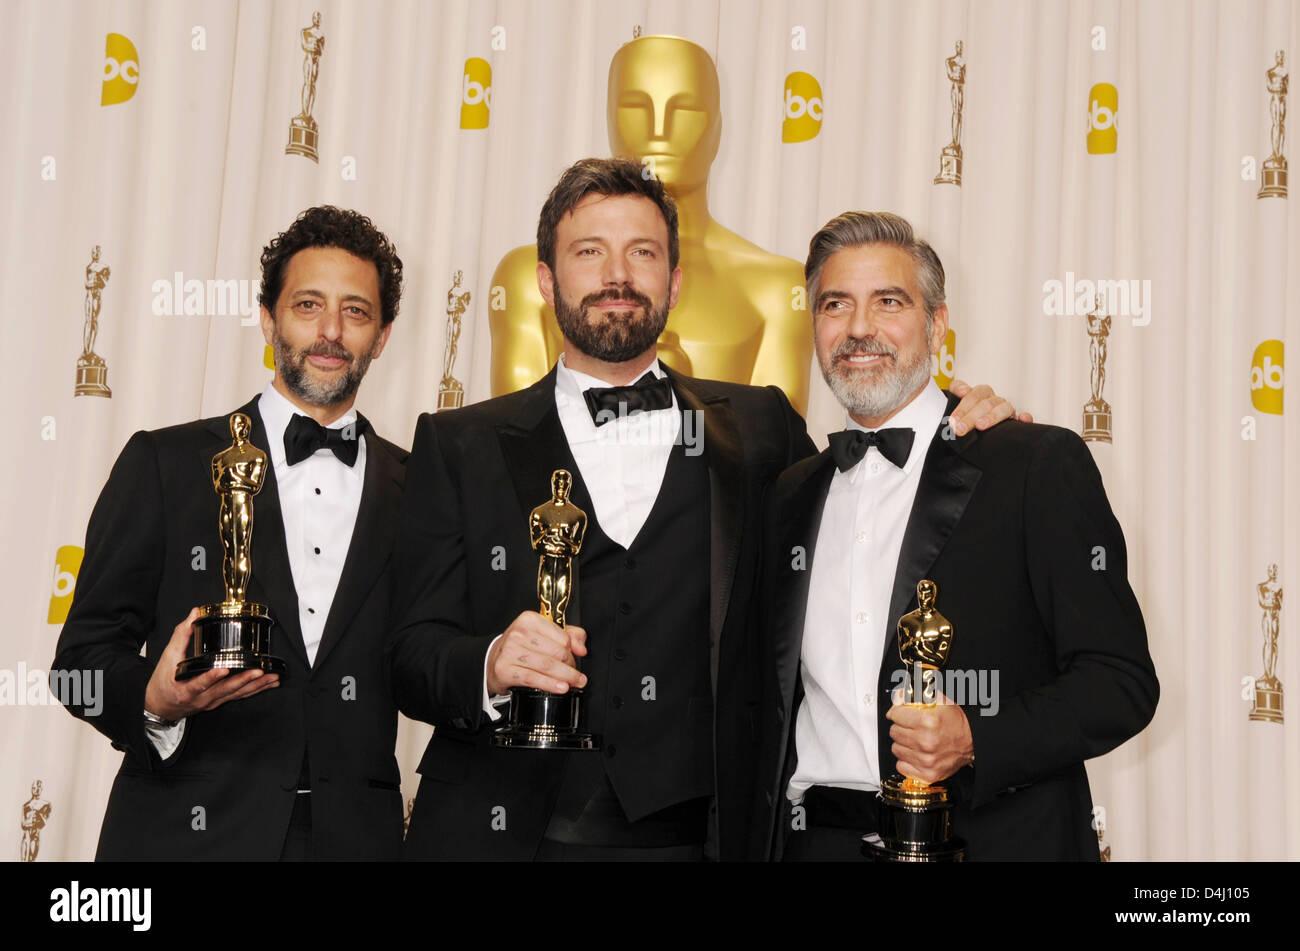 Argo 2012 Film Producers From L Grant Heslov Ben Affleck George Stock Photo Alamy